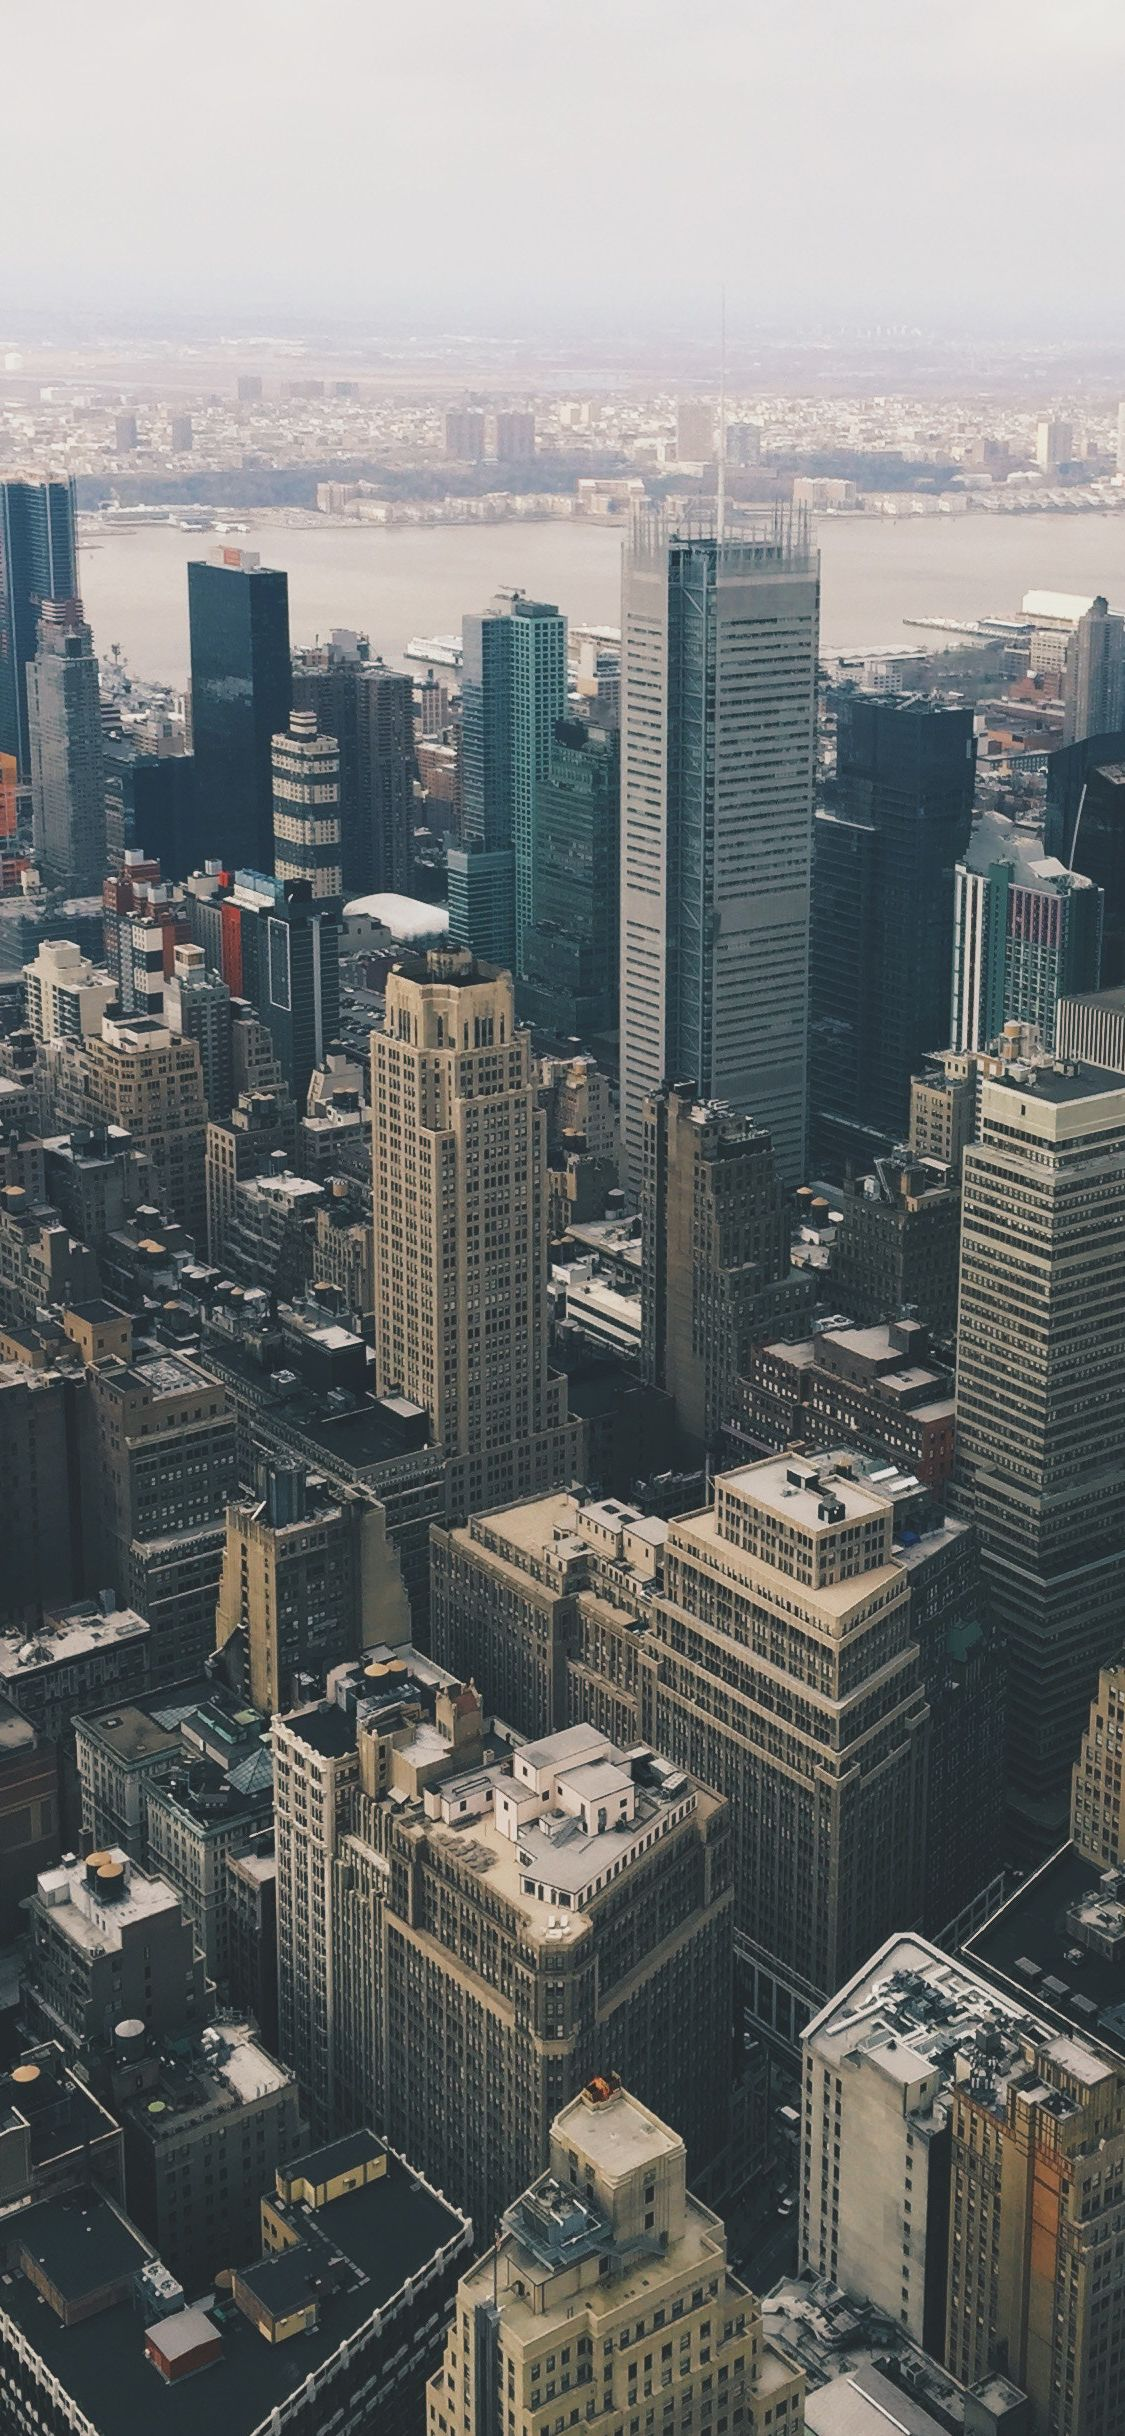 Cartoon New York Iphone Wallpapers Top Free Cartoon New York